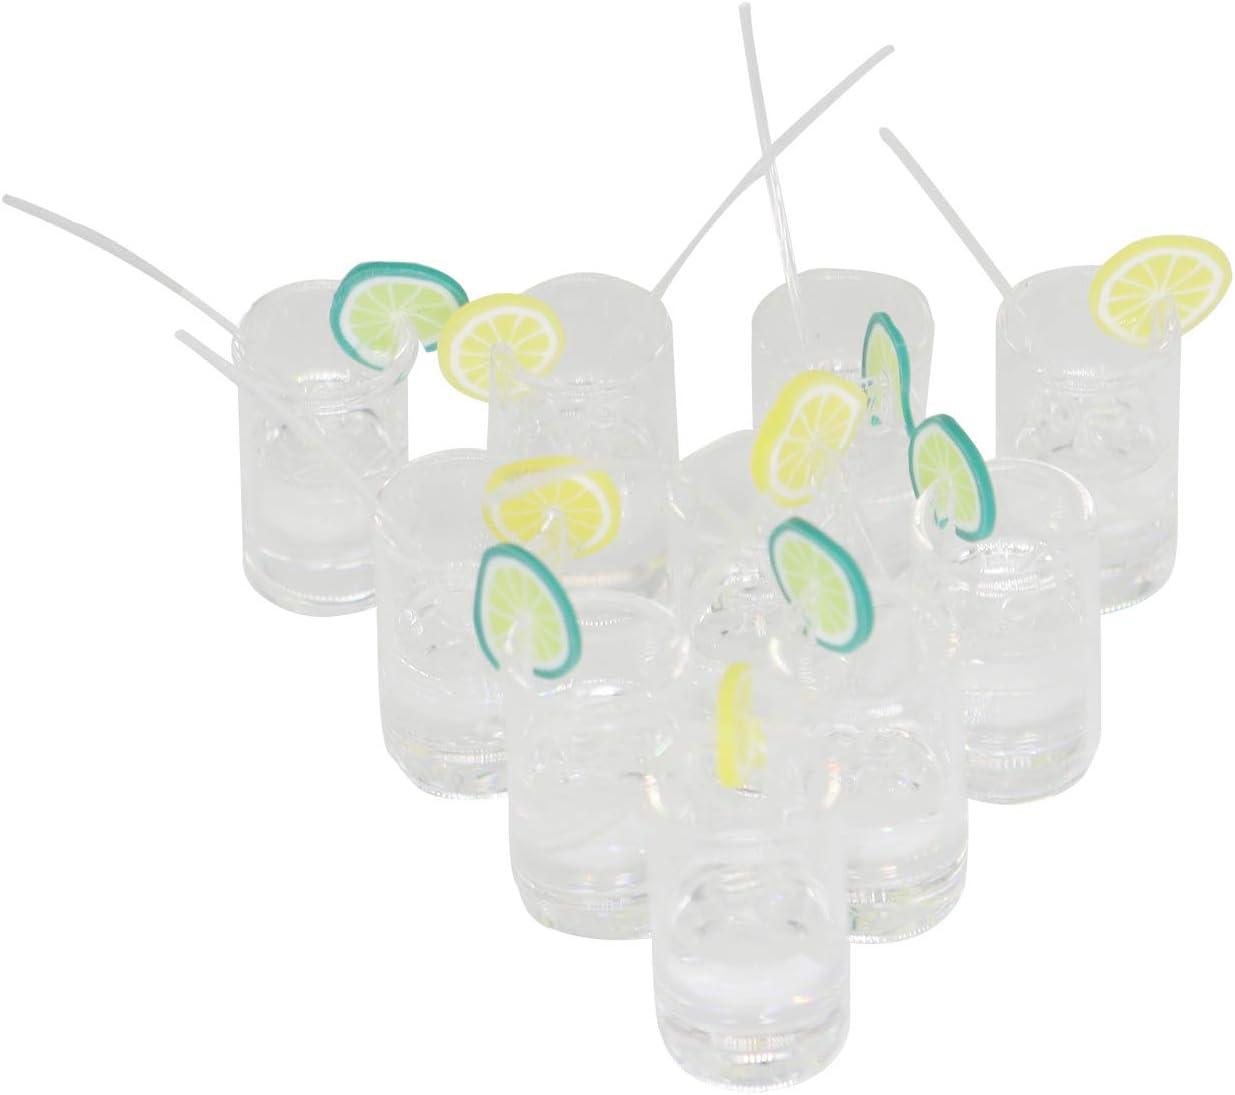 Hiawbon 10 pcs 1:12 Scale Mini Dollhouse Accessories Miniatures Yellow Green Lemon Water Cups Food Drinks Supplies